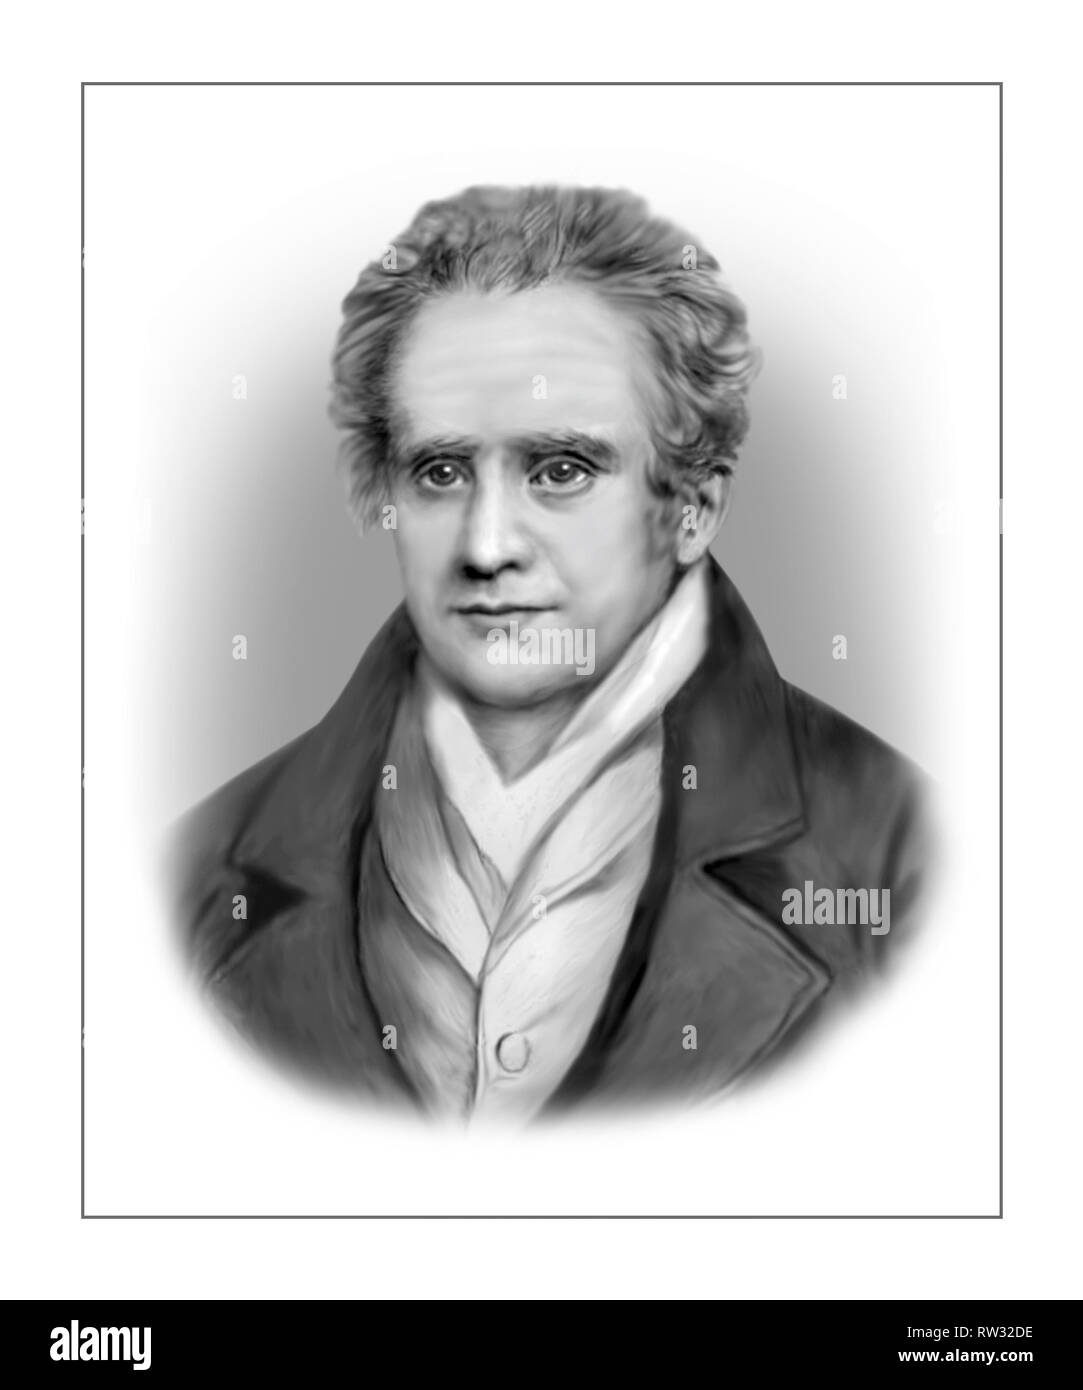 Gaspard Monge 1746-1818 French Mathematician - Stock Image